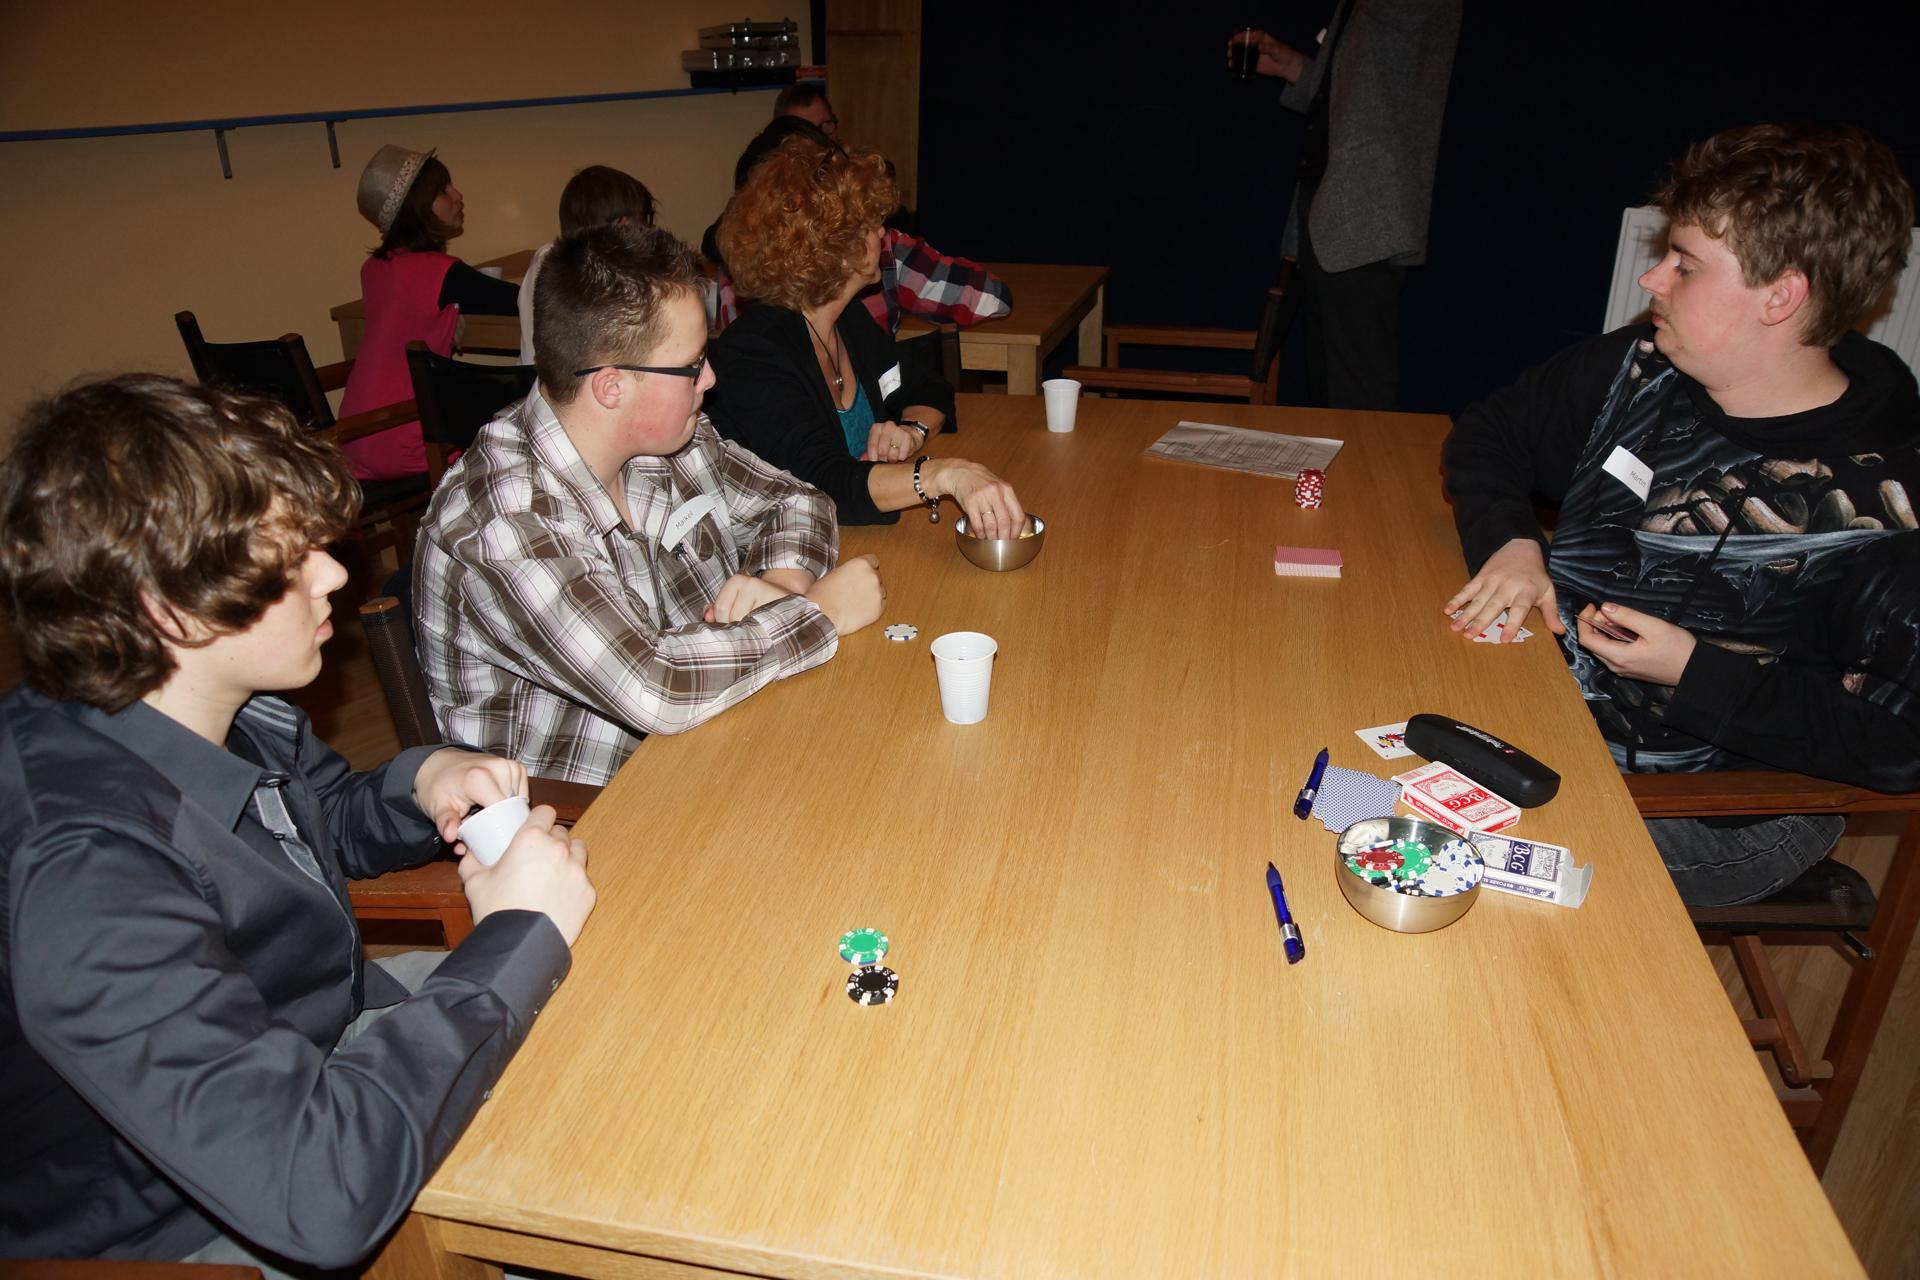 Casino en gala Soosjaal 1 december 2012